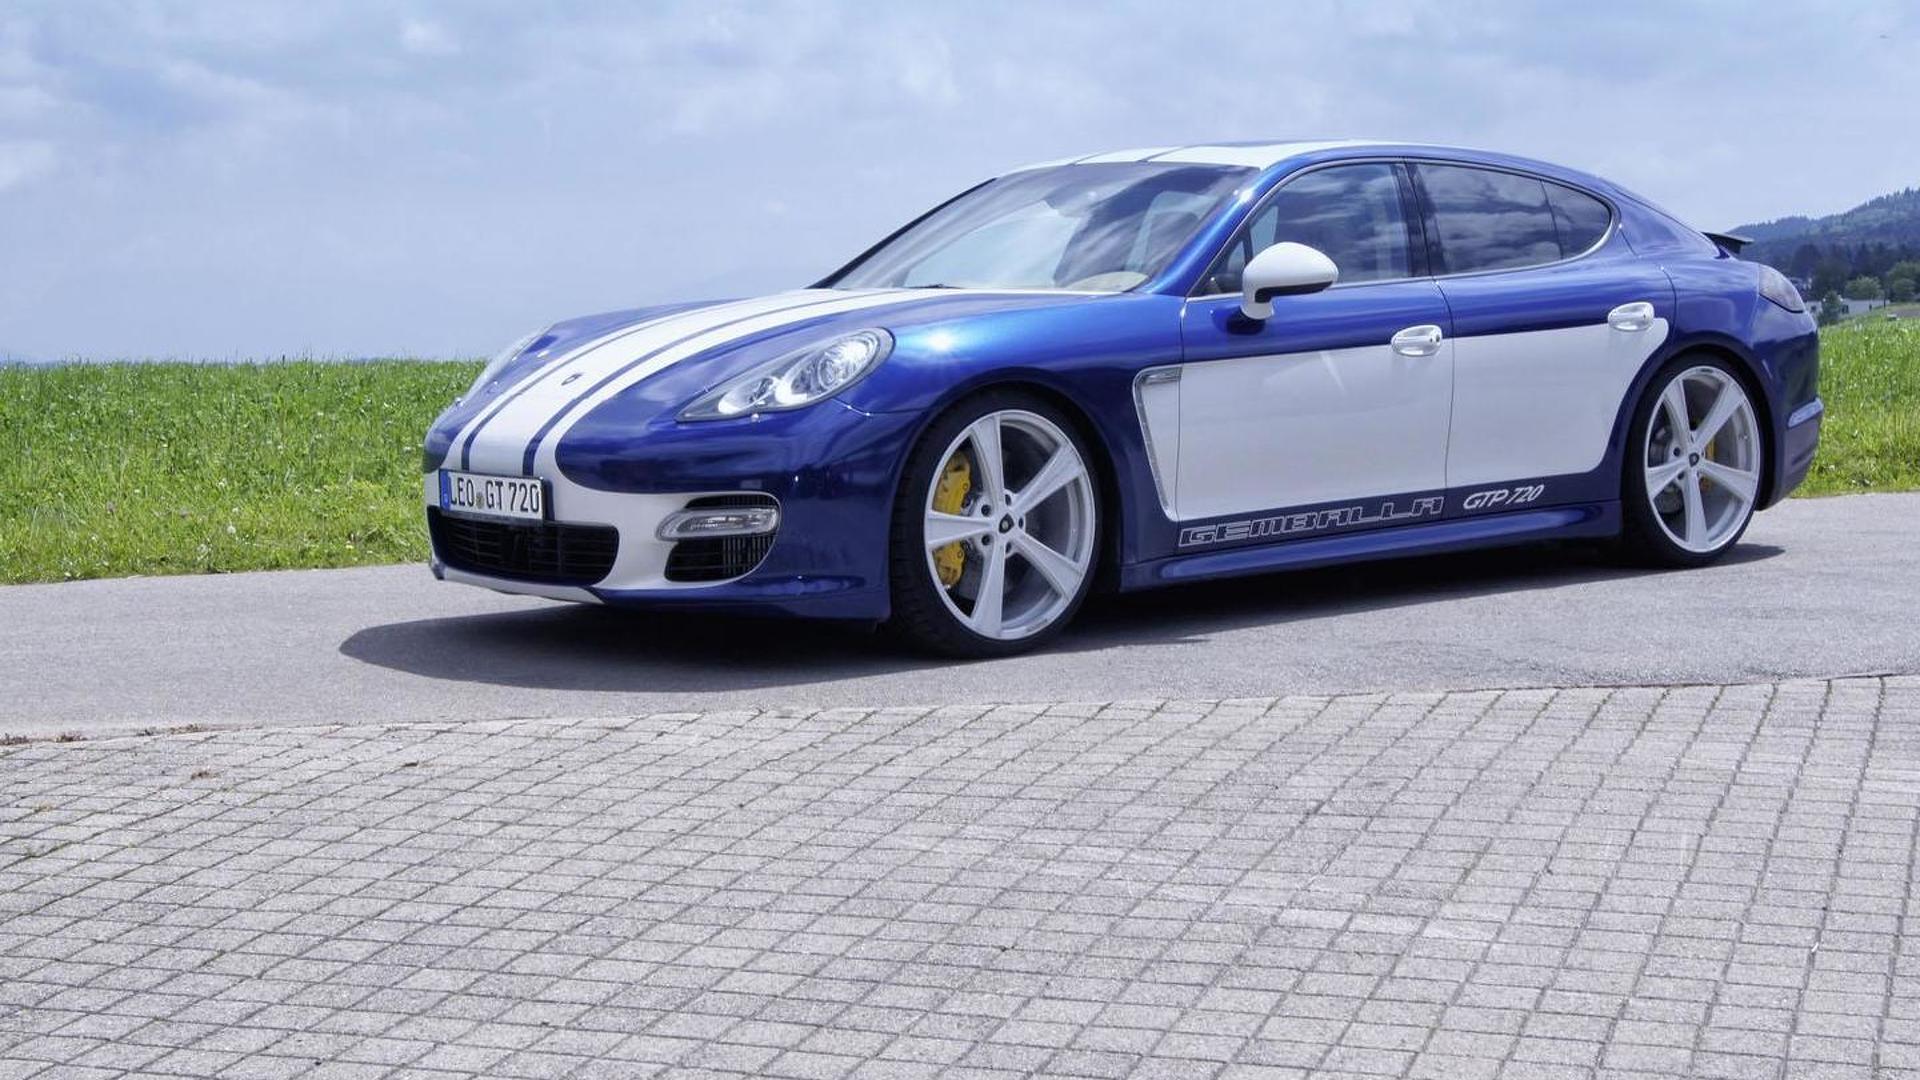 Новая Porsche Panamera GTP 720. Тюнинг от Gemballa